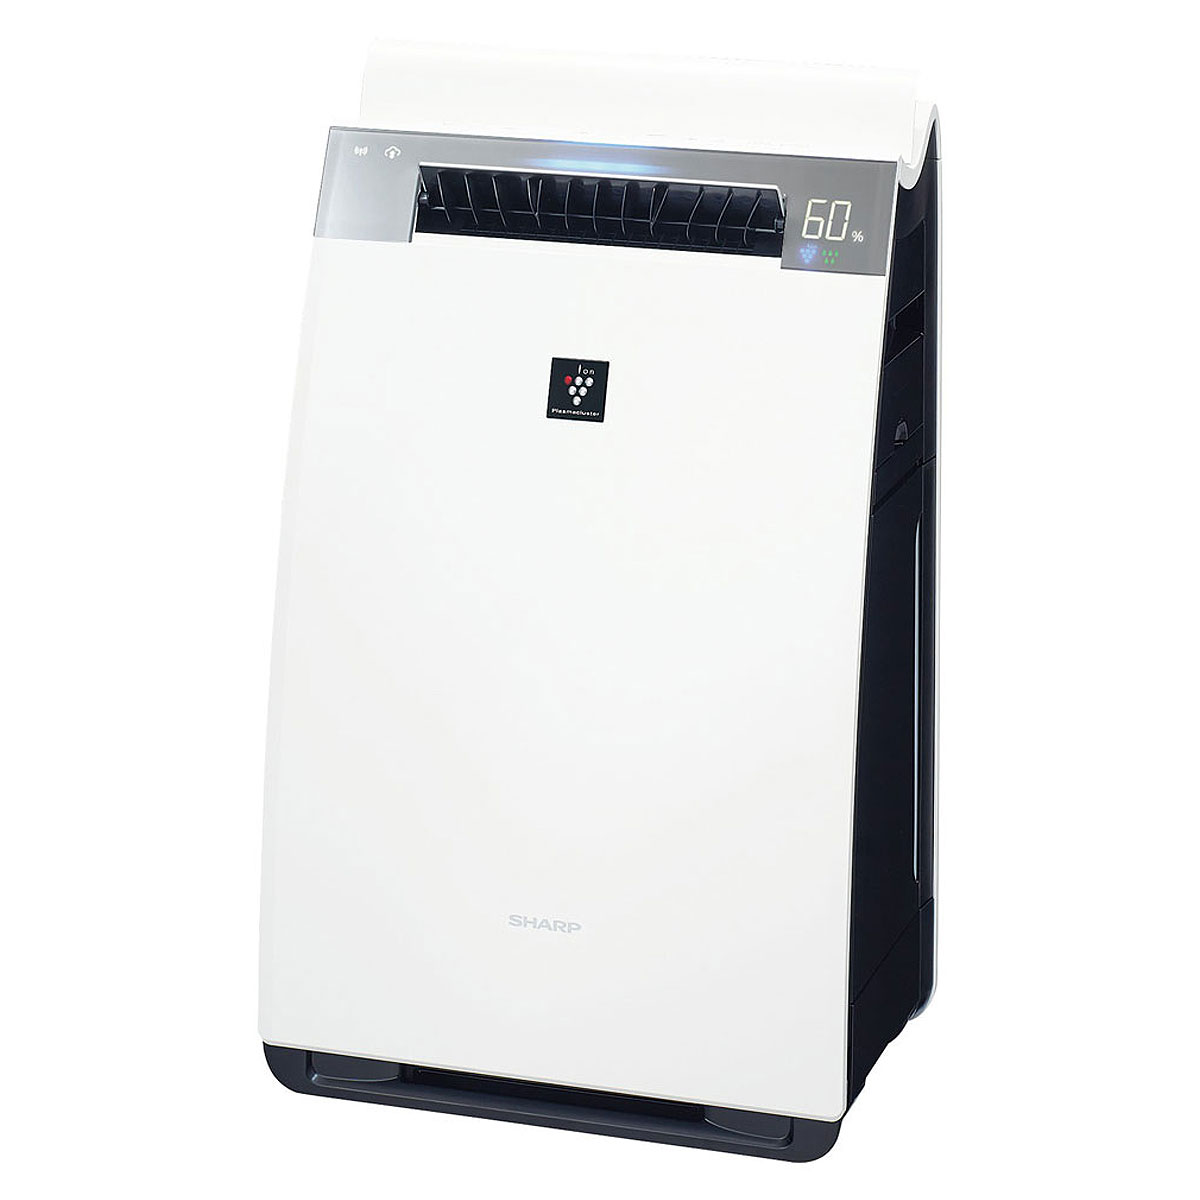 SHARP KI-JX75-W 加湿空気清浄機 【別途延長保証契約可能】【宅配便送料無料】※他商品との同梱不可 (wn0626)(1213897)